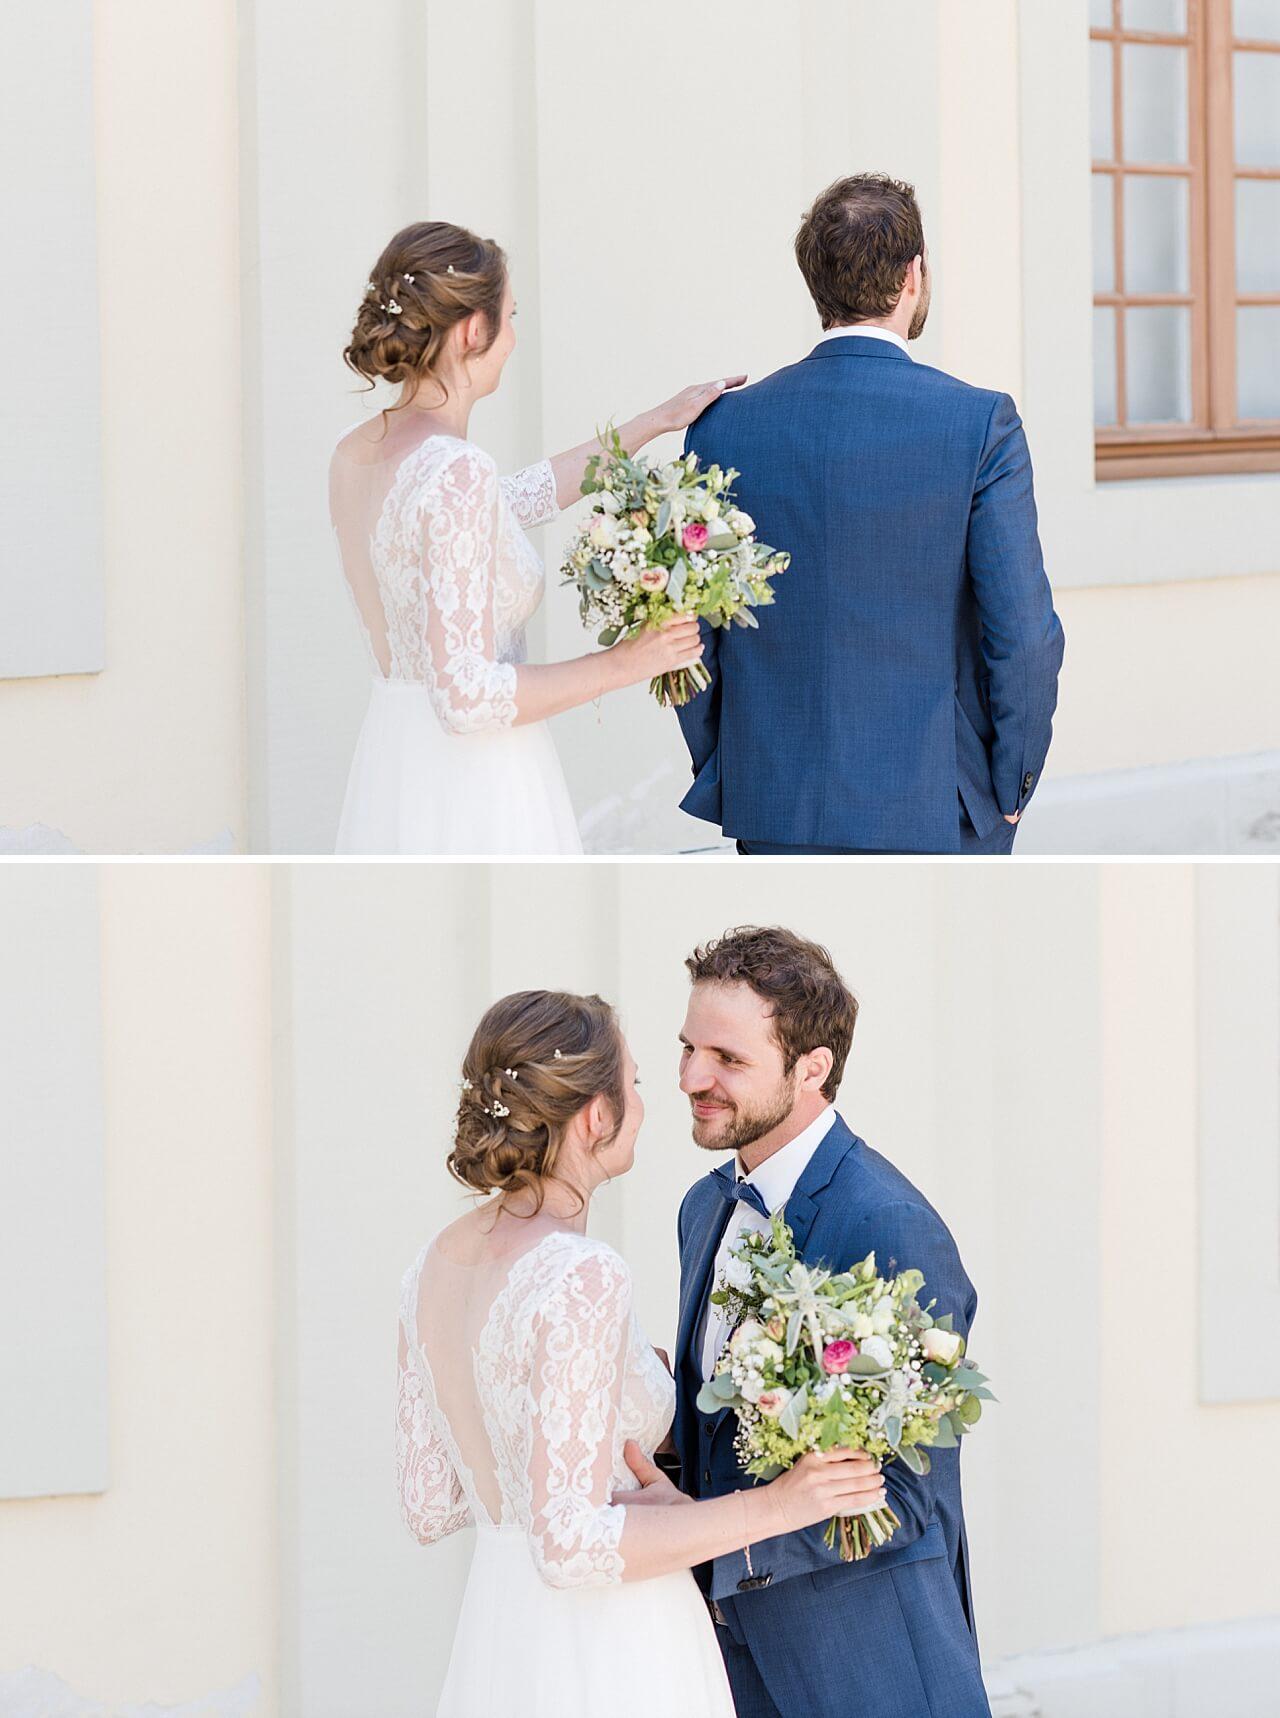 Rebecca Conte Fotografie: Romantische Hochzeitsfotos 02